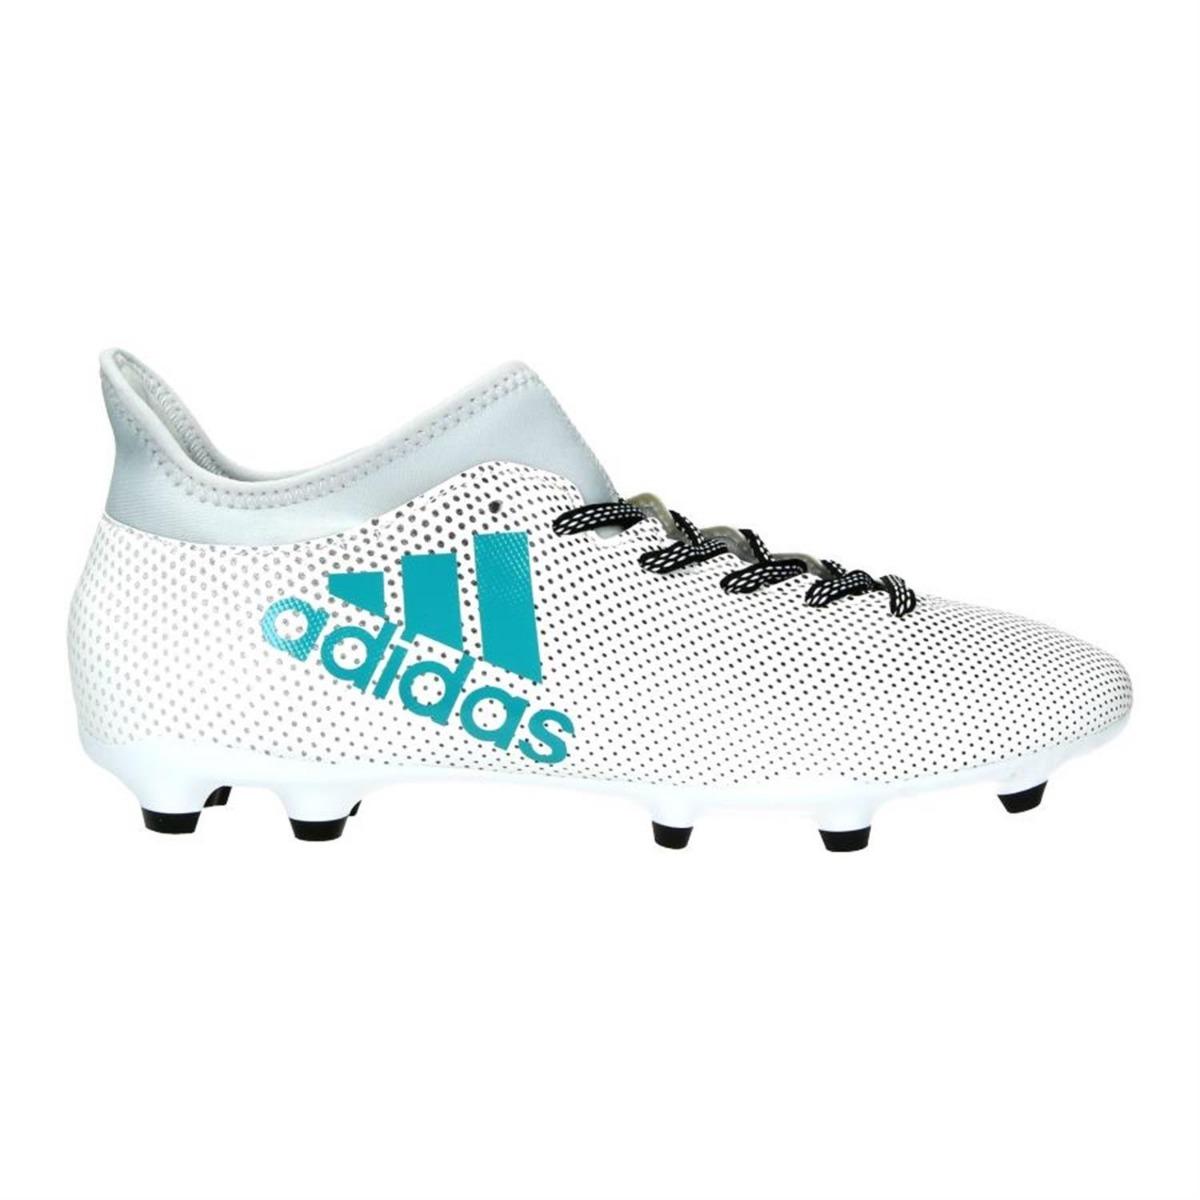 Zapato Futbol adidas Bota X 17.3 Fg Junior - Zapatera -   895.00 en ... bcb1a71c2ef90